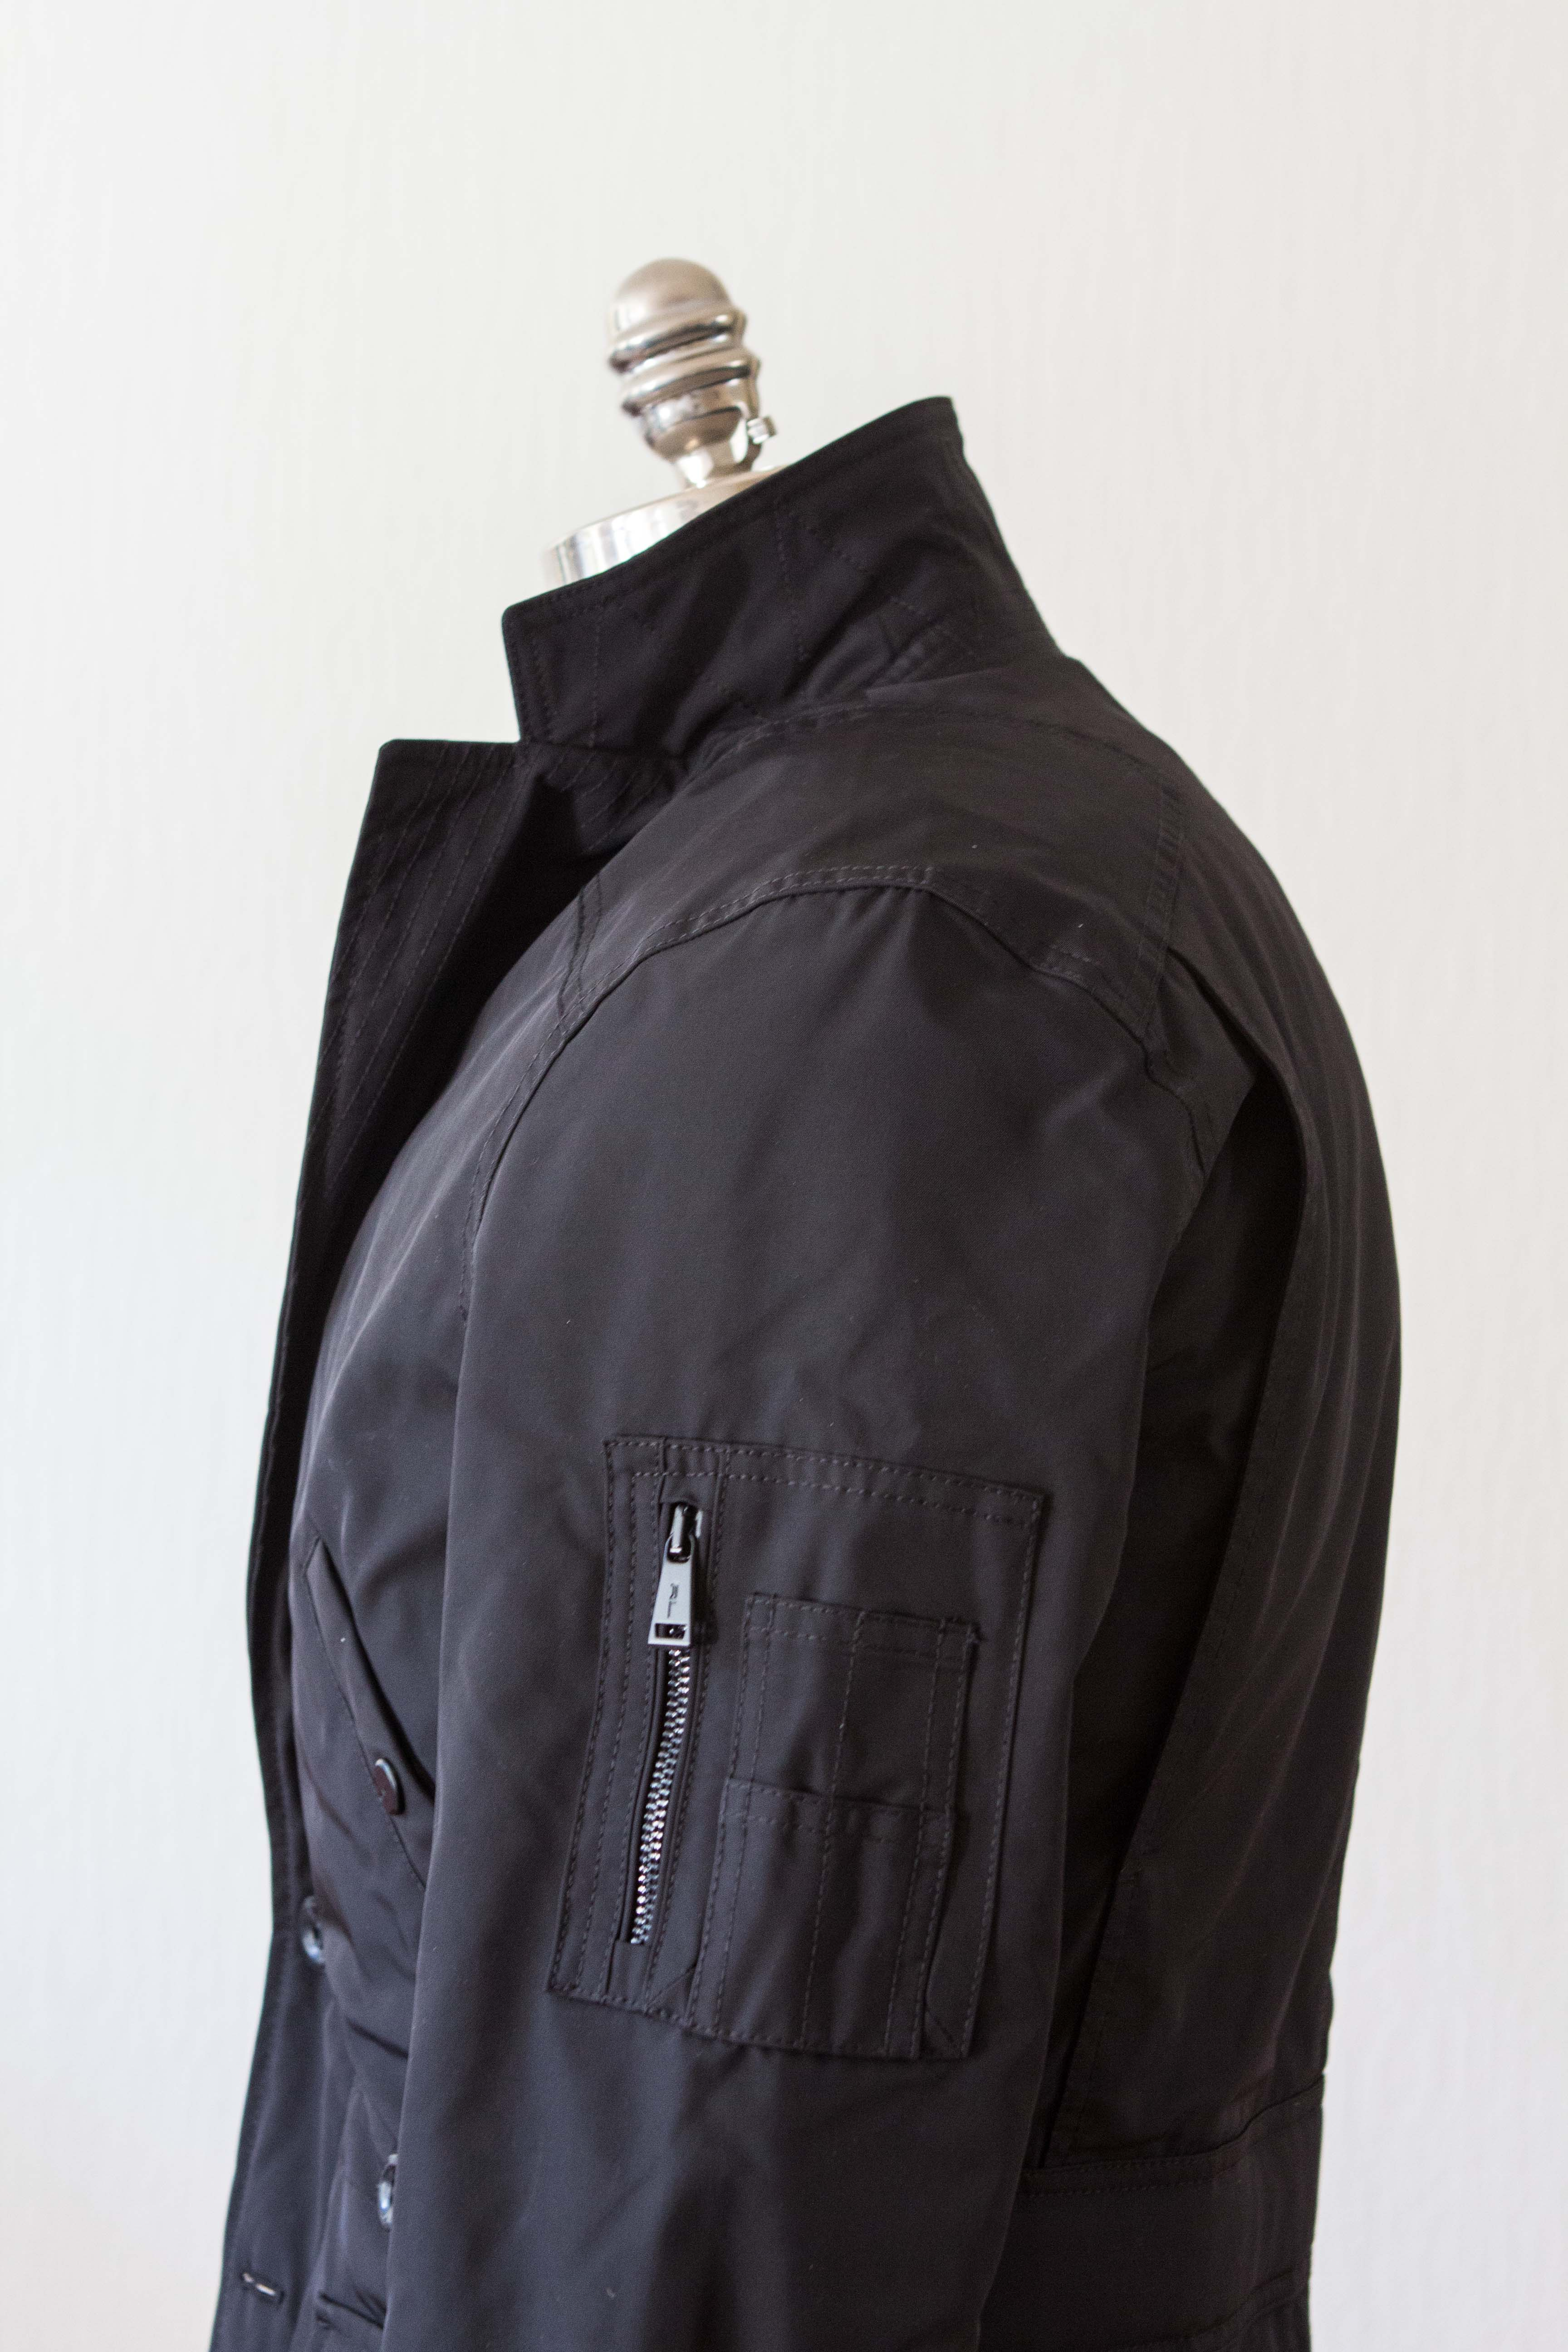 Military sc-lined-jacket - 06.jpg